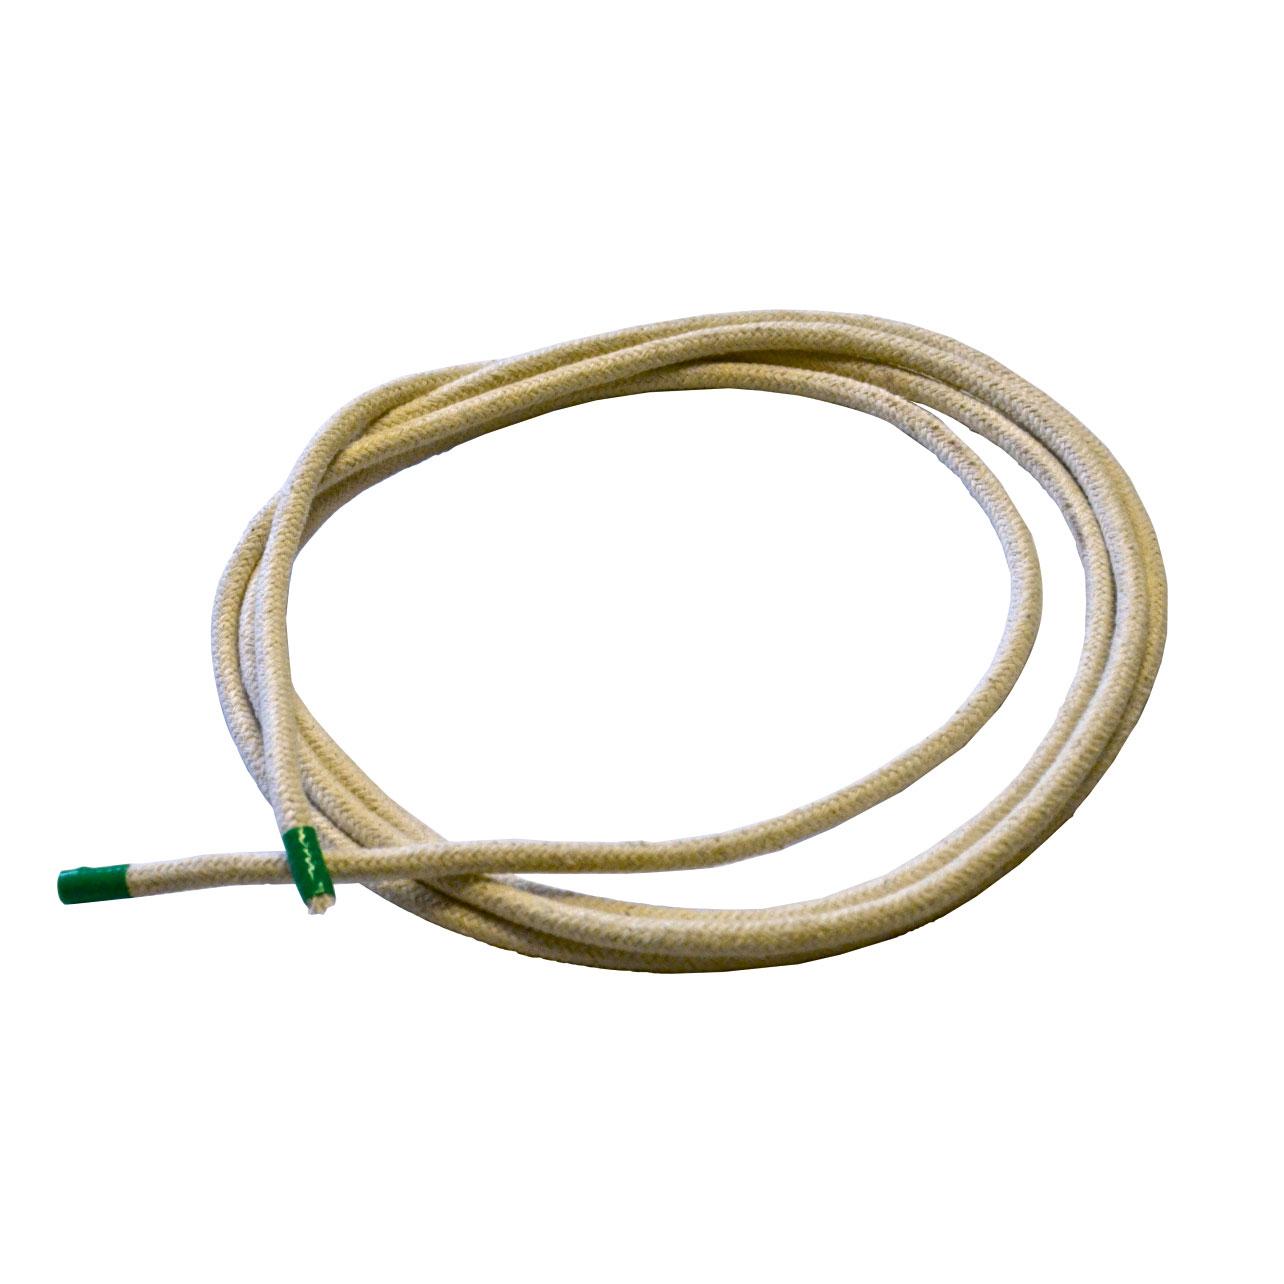 Kgati Skipping Ropes Polycotton 3m